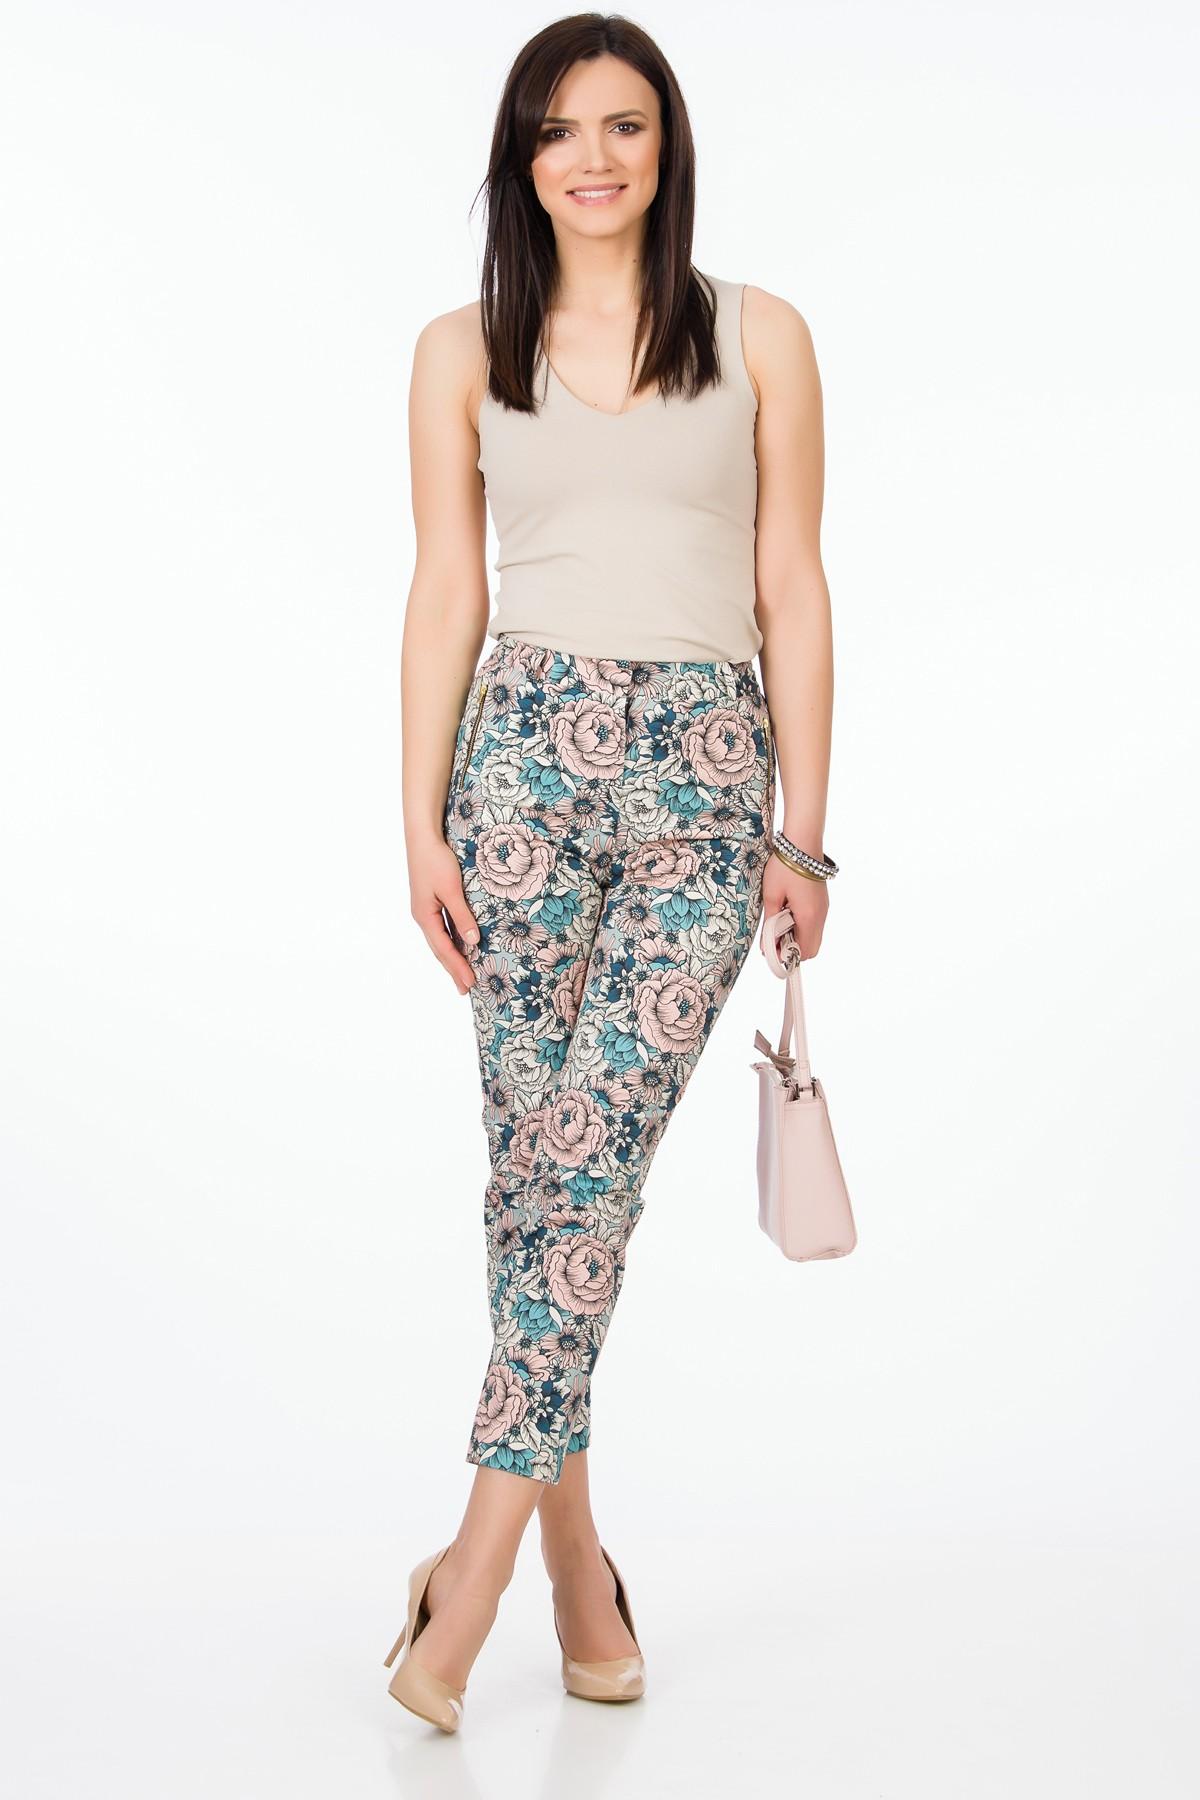 pantaloni-flori-pastel-sense